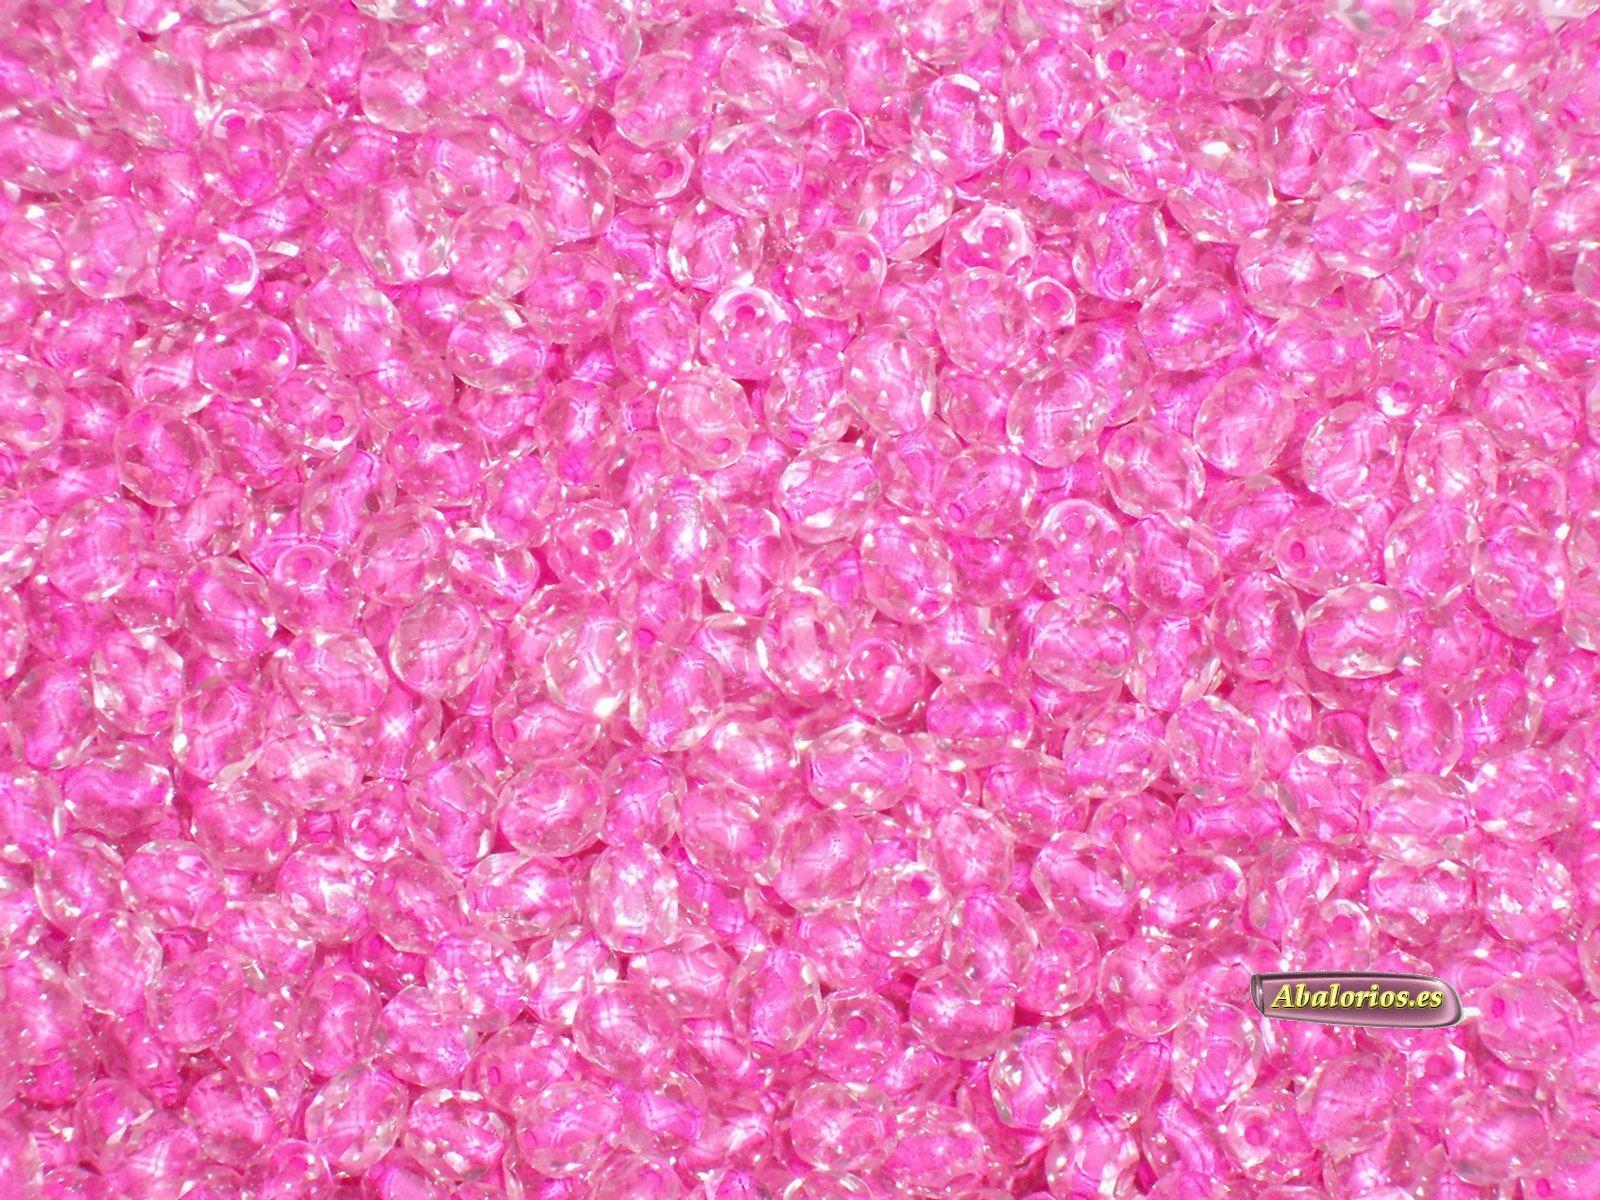 Fondos De Pantalla Rosa: Colores En La Web